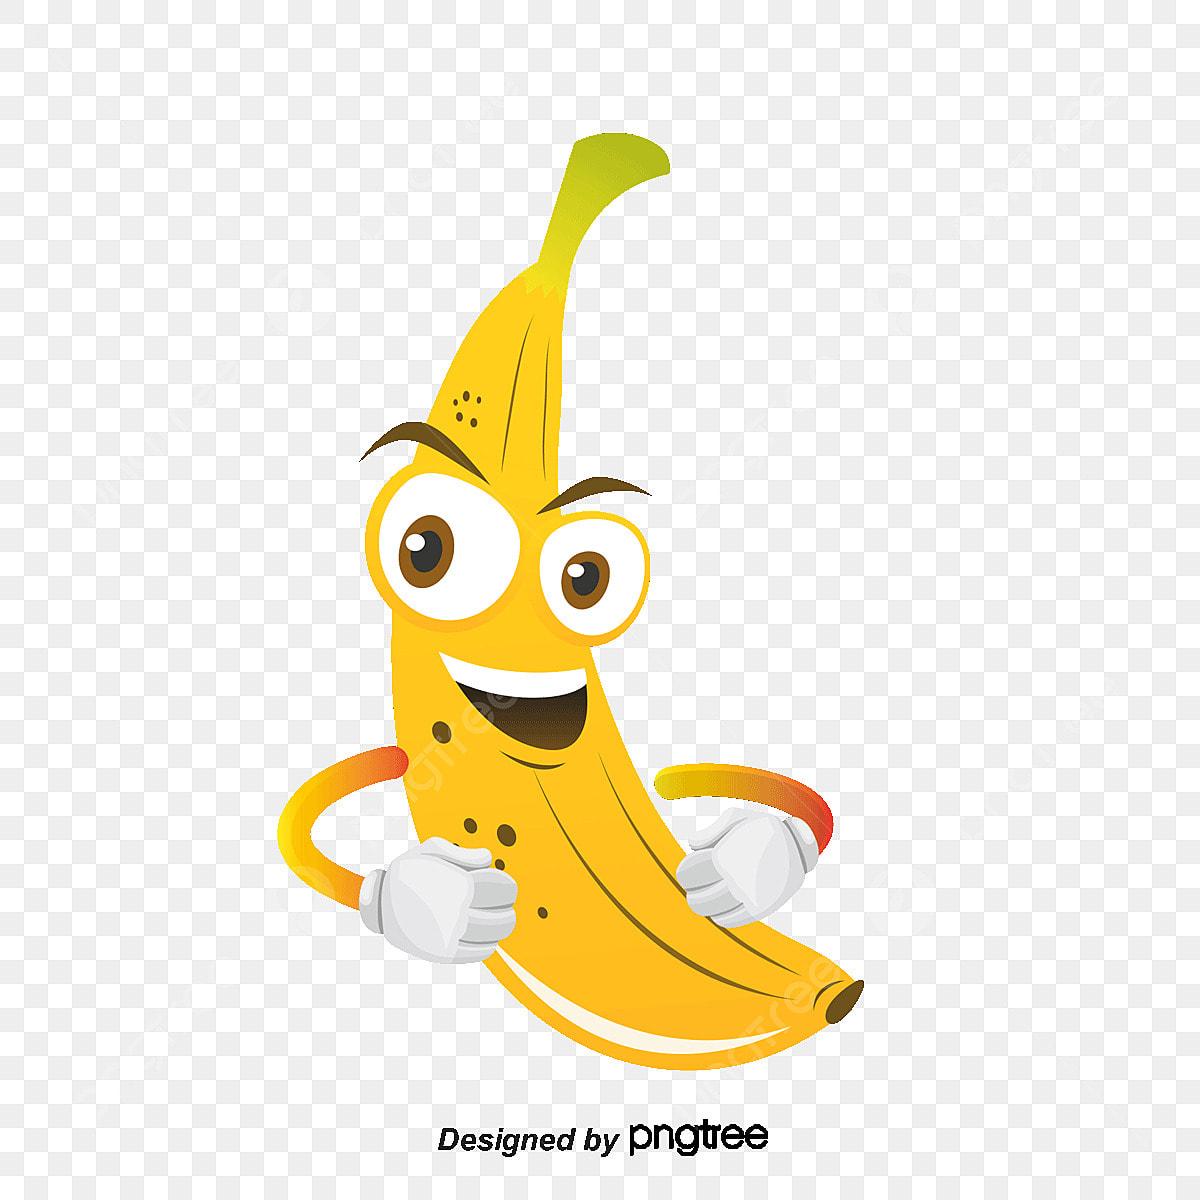 gambar cute kartun pisang vektor pisang pisang vektor kartun vektor png dan psd untuk muat turun percuma https ms pngtree com freepng cartoon banana vector 2728849 html